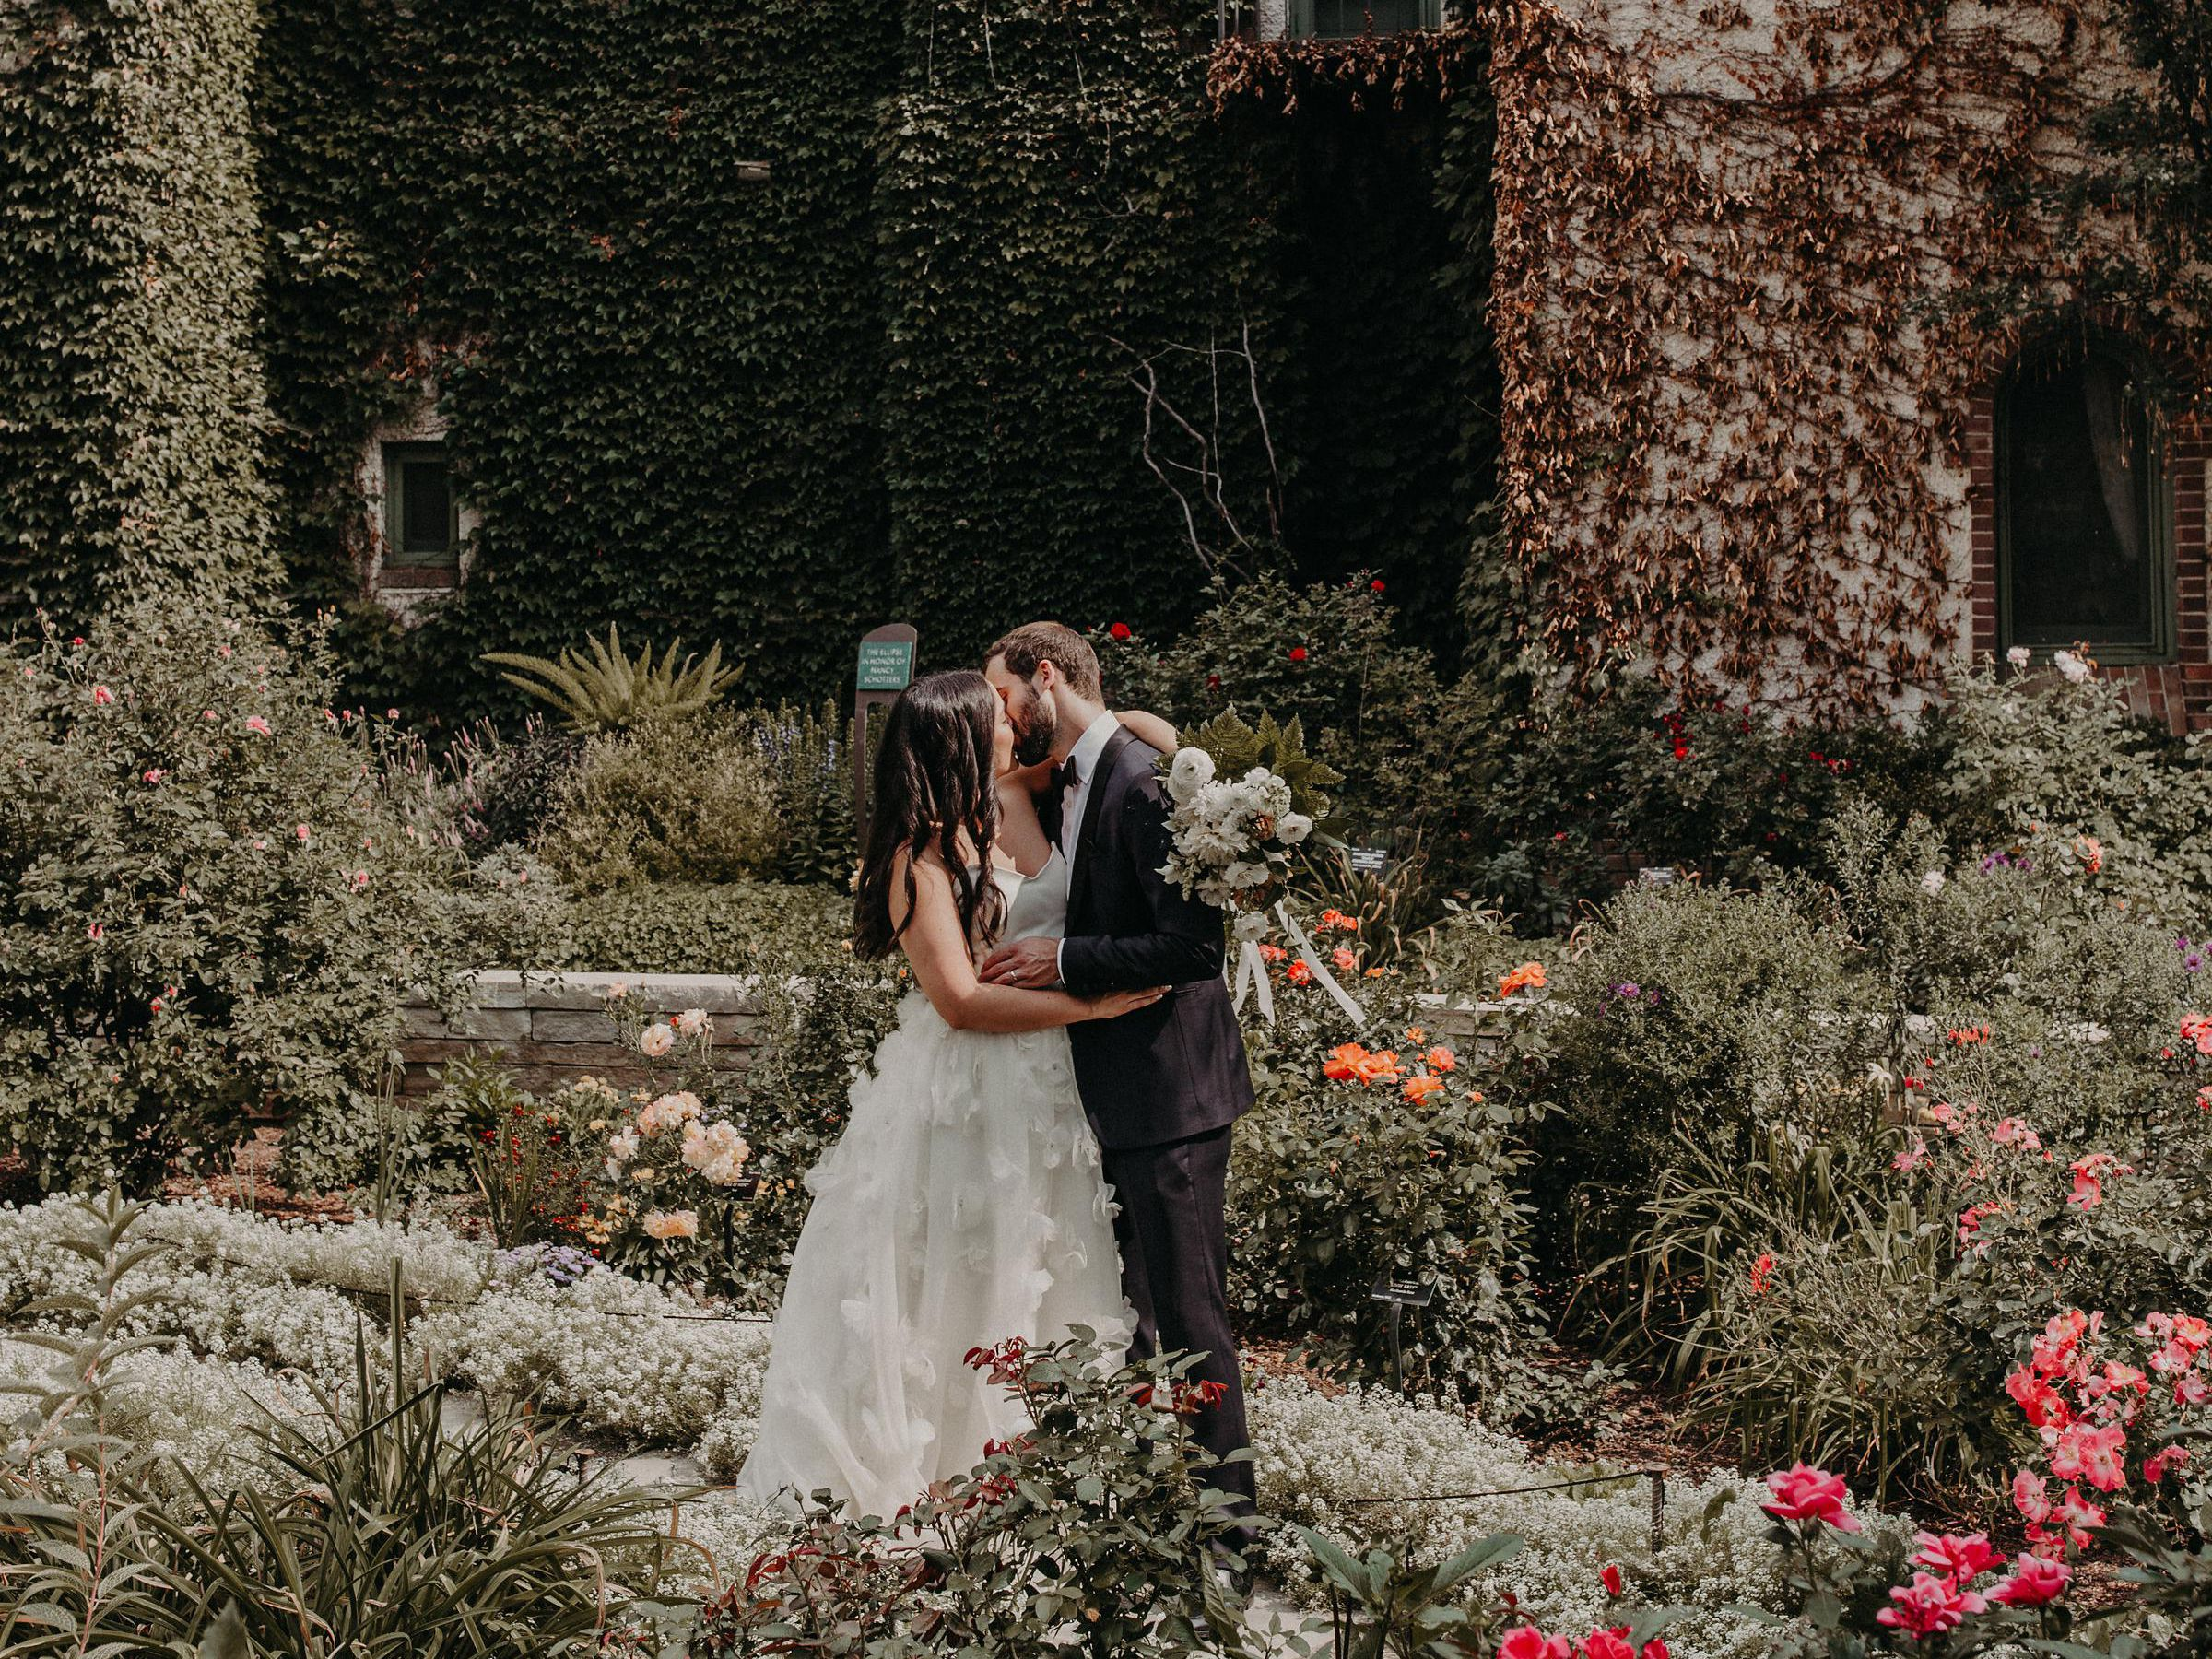 18 Romantic Wedding Ideas You Ll Fall For